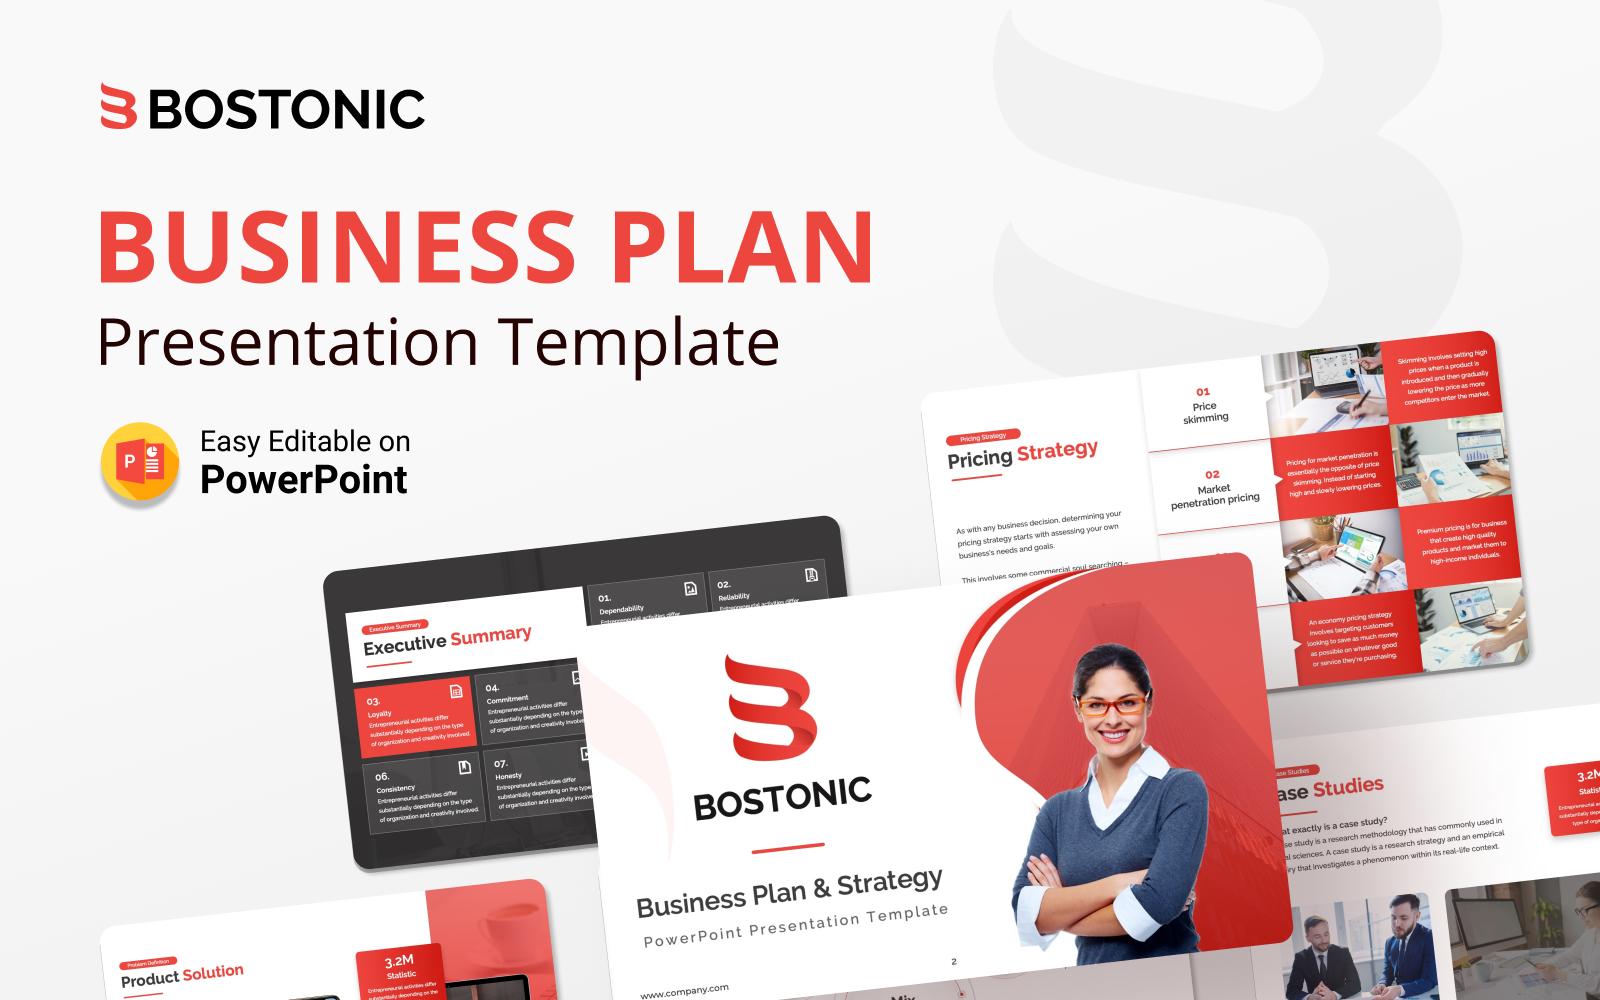 Bostonic Business Plan PowerPoint Presentation Template